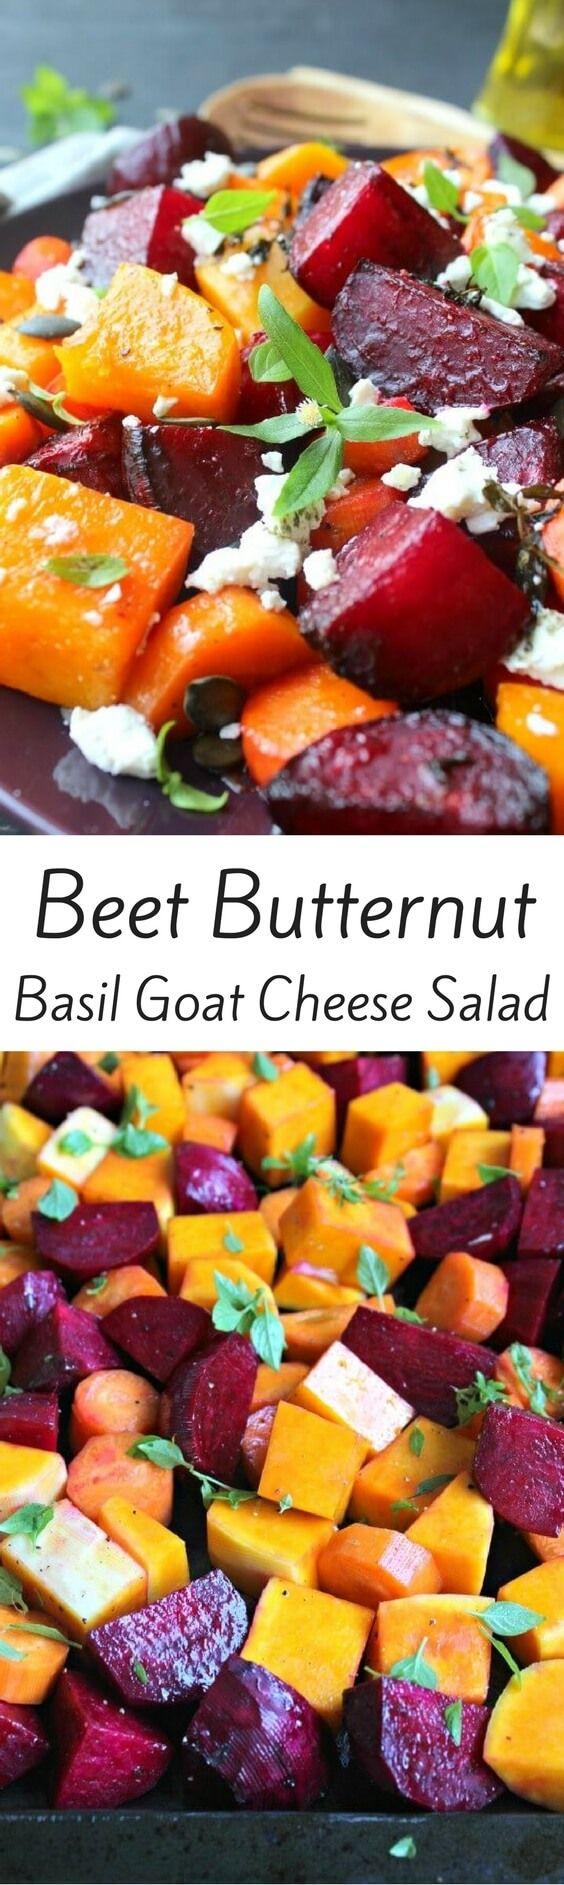 Beet Butternut Squash Basil Goat Cheese Salad